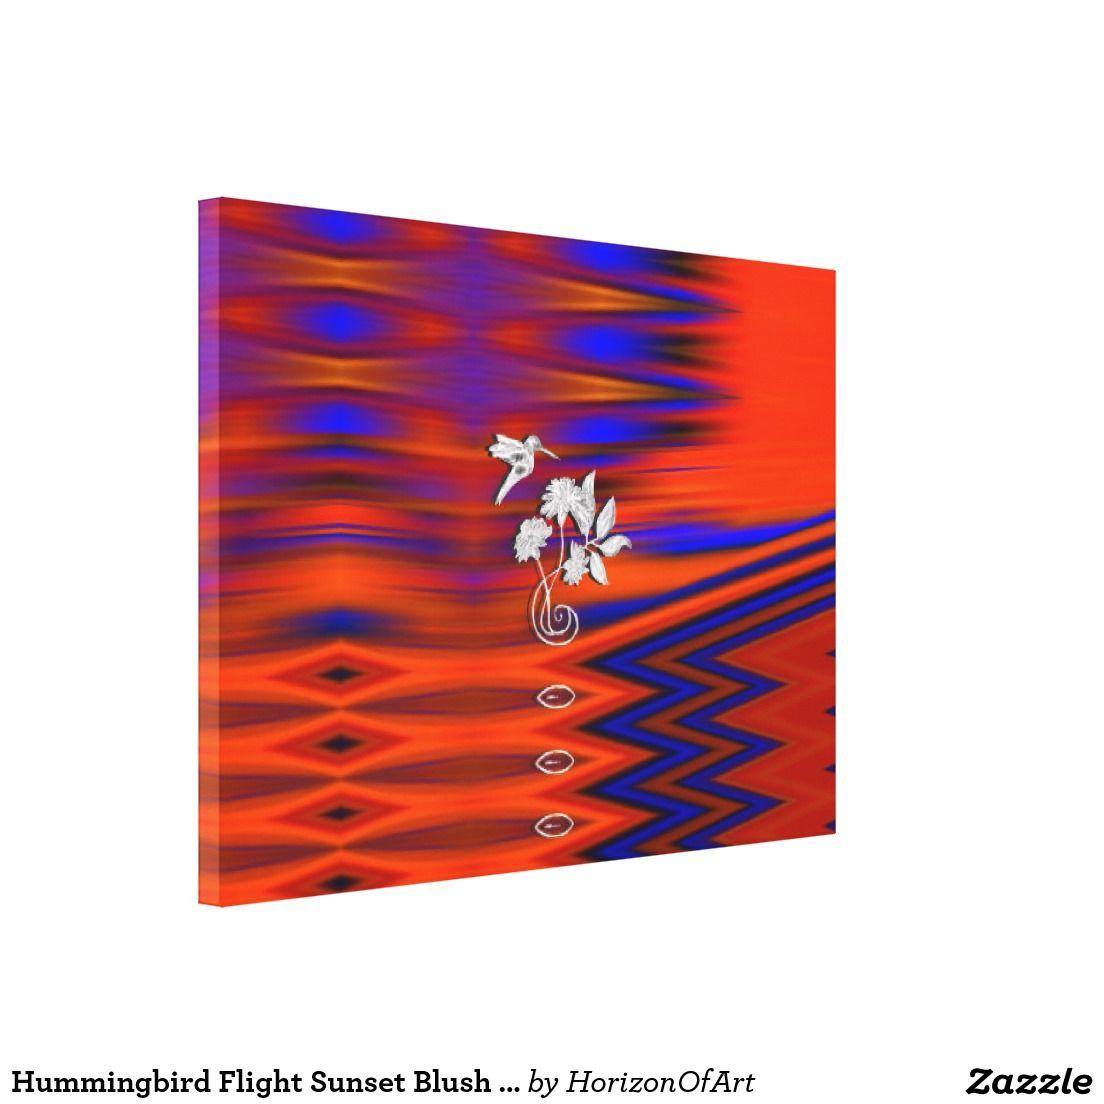 Hummingbird Flight Sunset Blush Wrapped Canvas